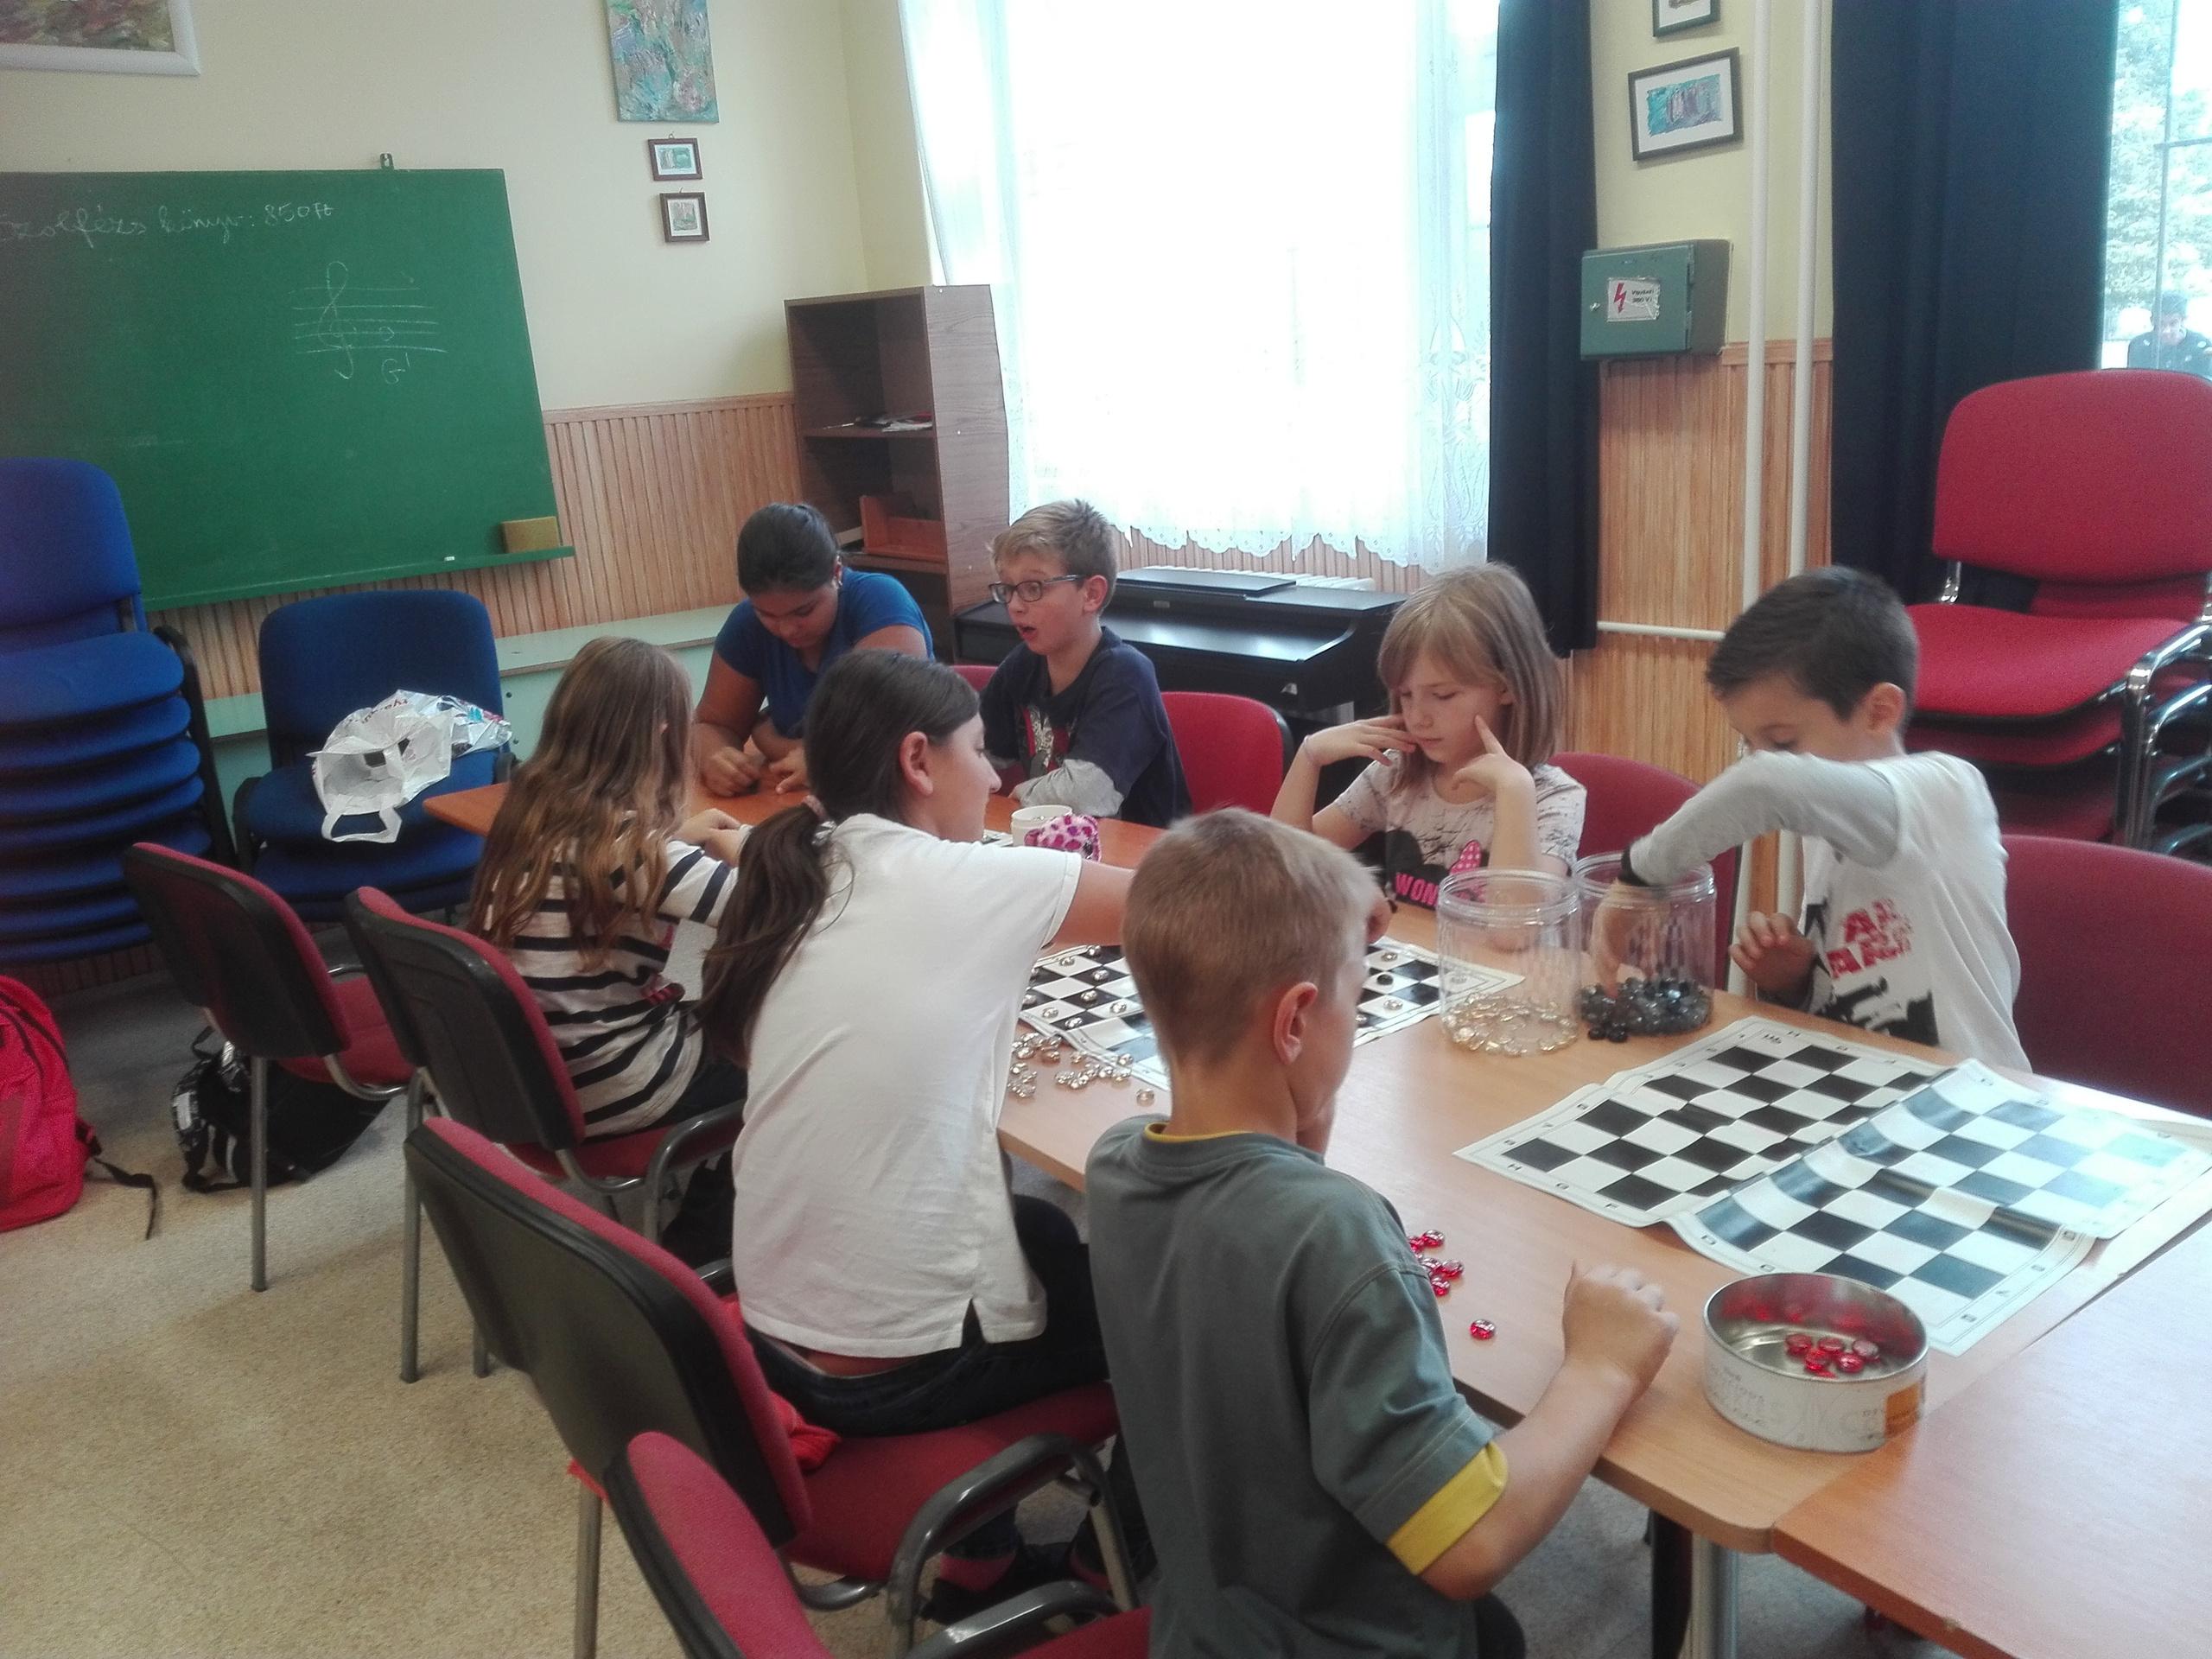 Selyemréti Iskola: IMG 20181018 144945 - indafoto.hu